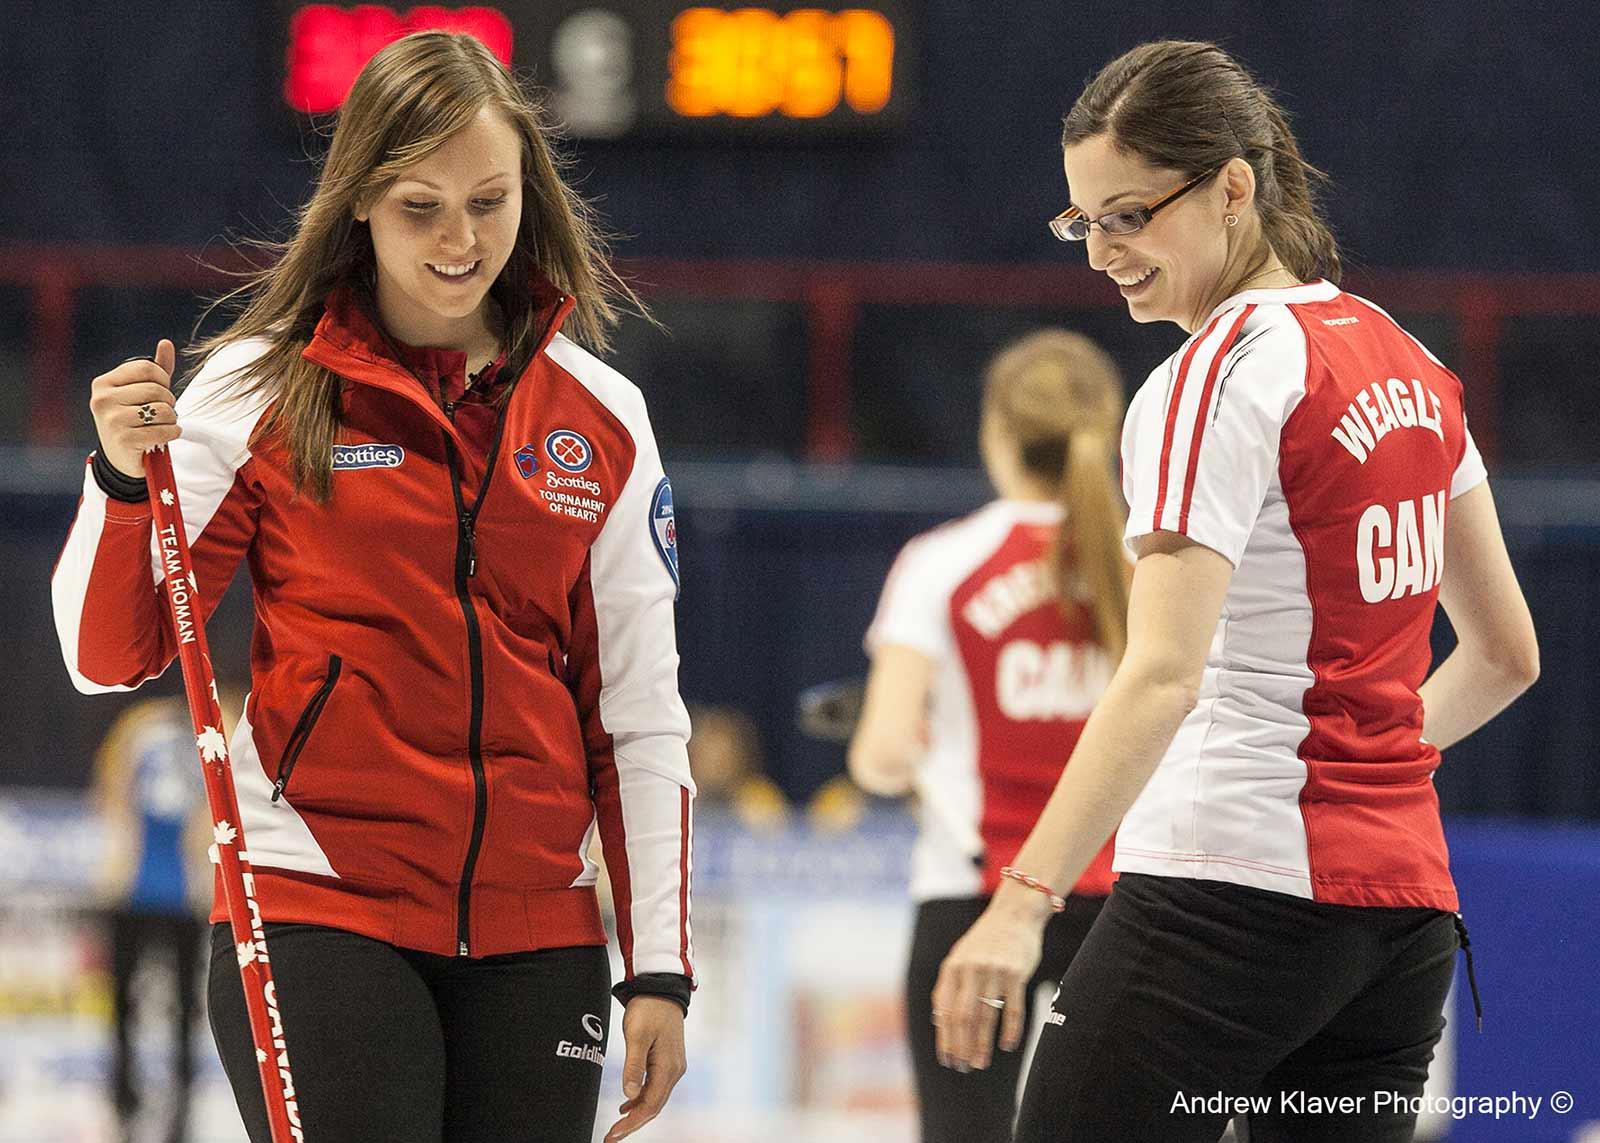 Returning Canadian champion Skip Rachel Holman